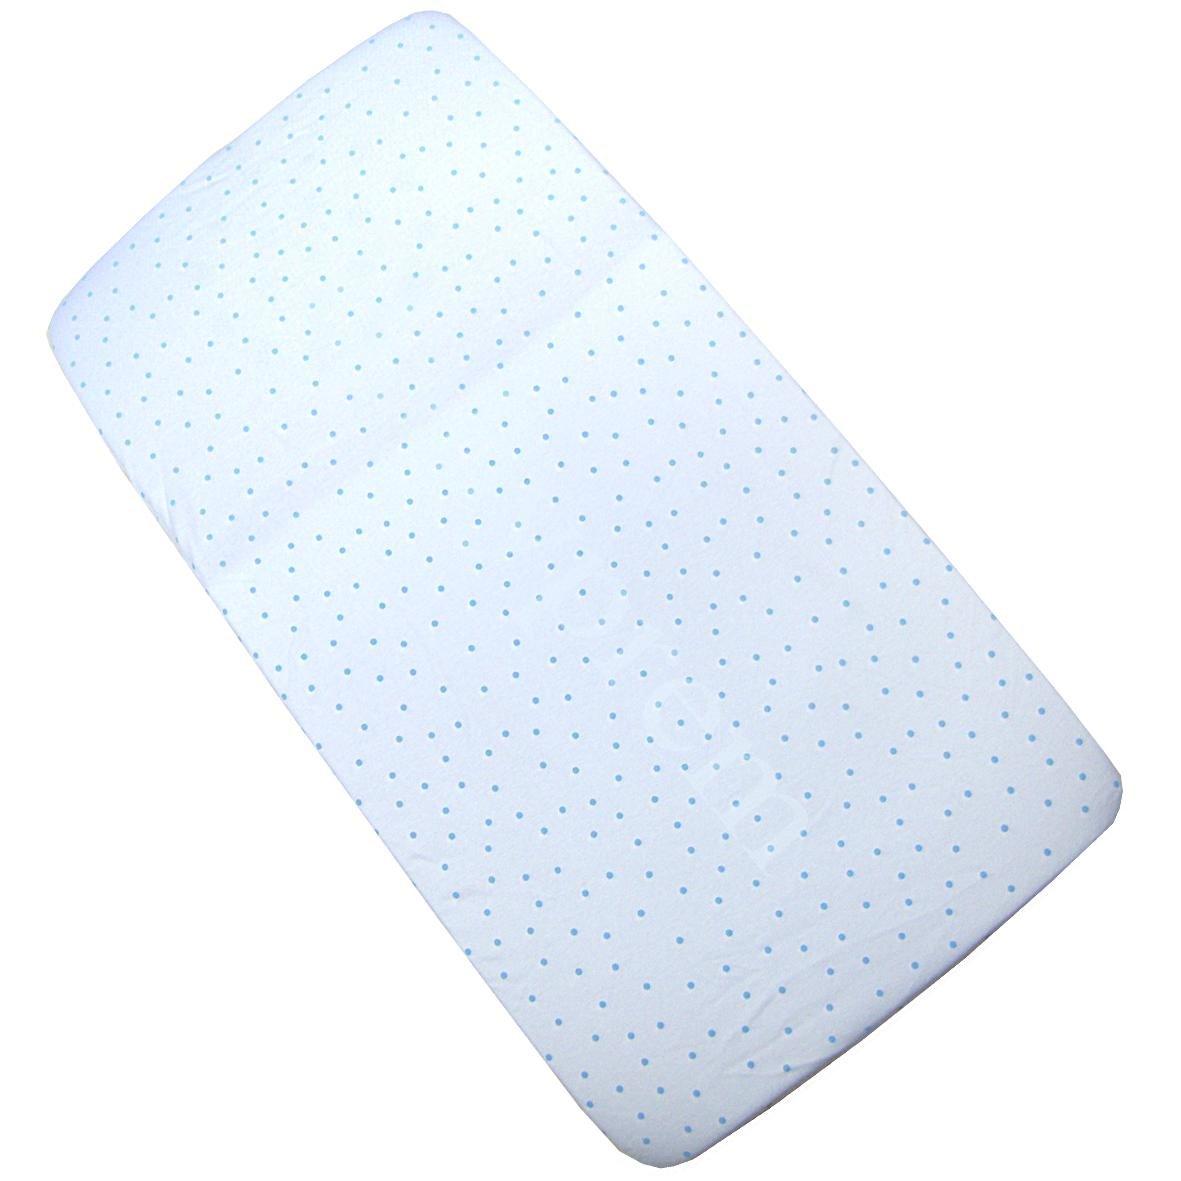 BabyPrem Baby Bedding Fitted Cotton Cradle Pram Sheet 35'' x 16'' BLUE SPOT